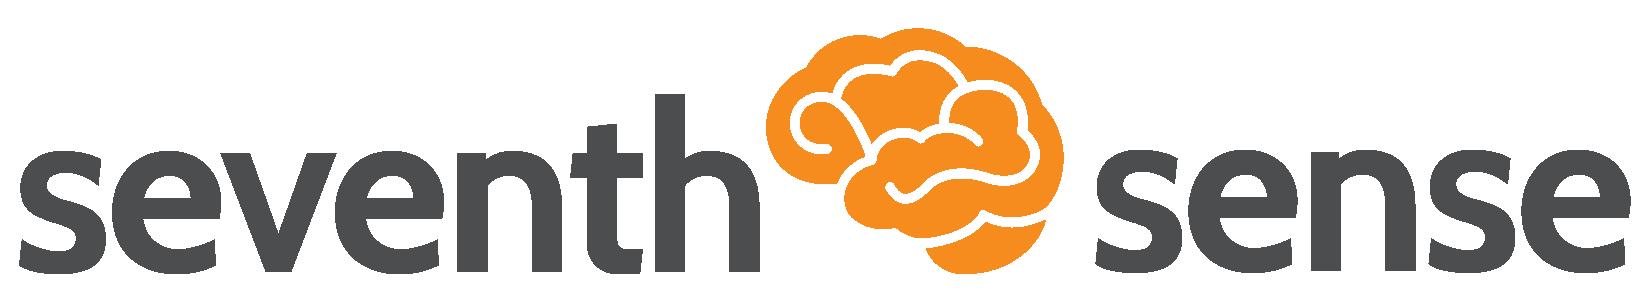 seventh-sense-logo.jpg